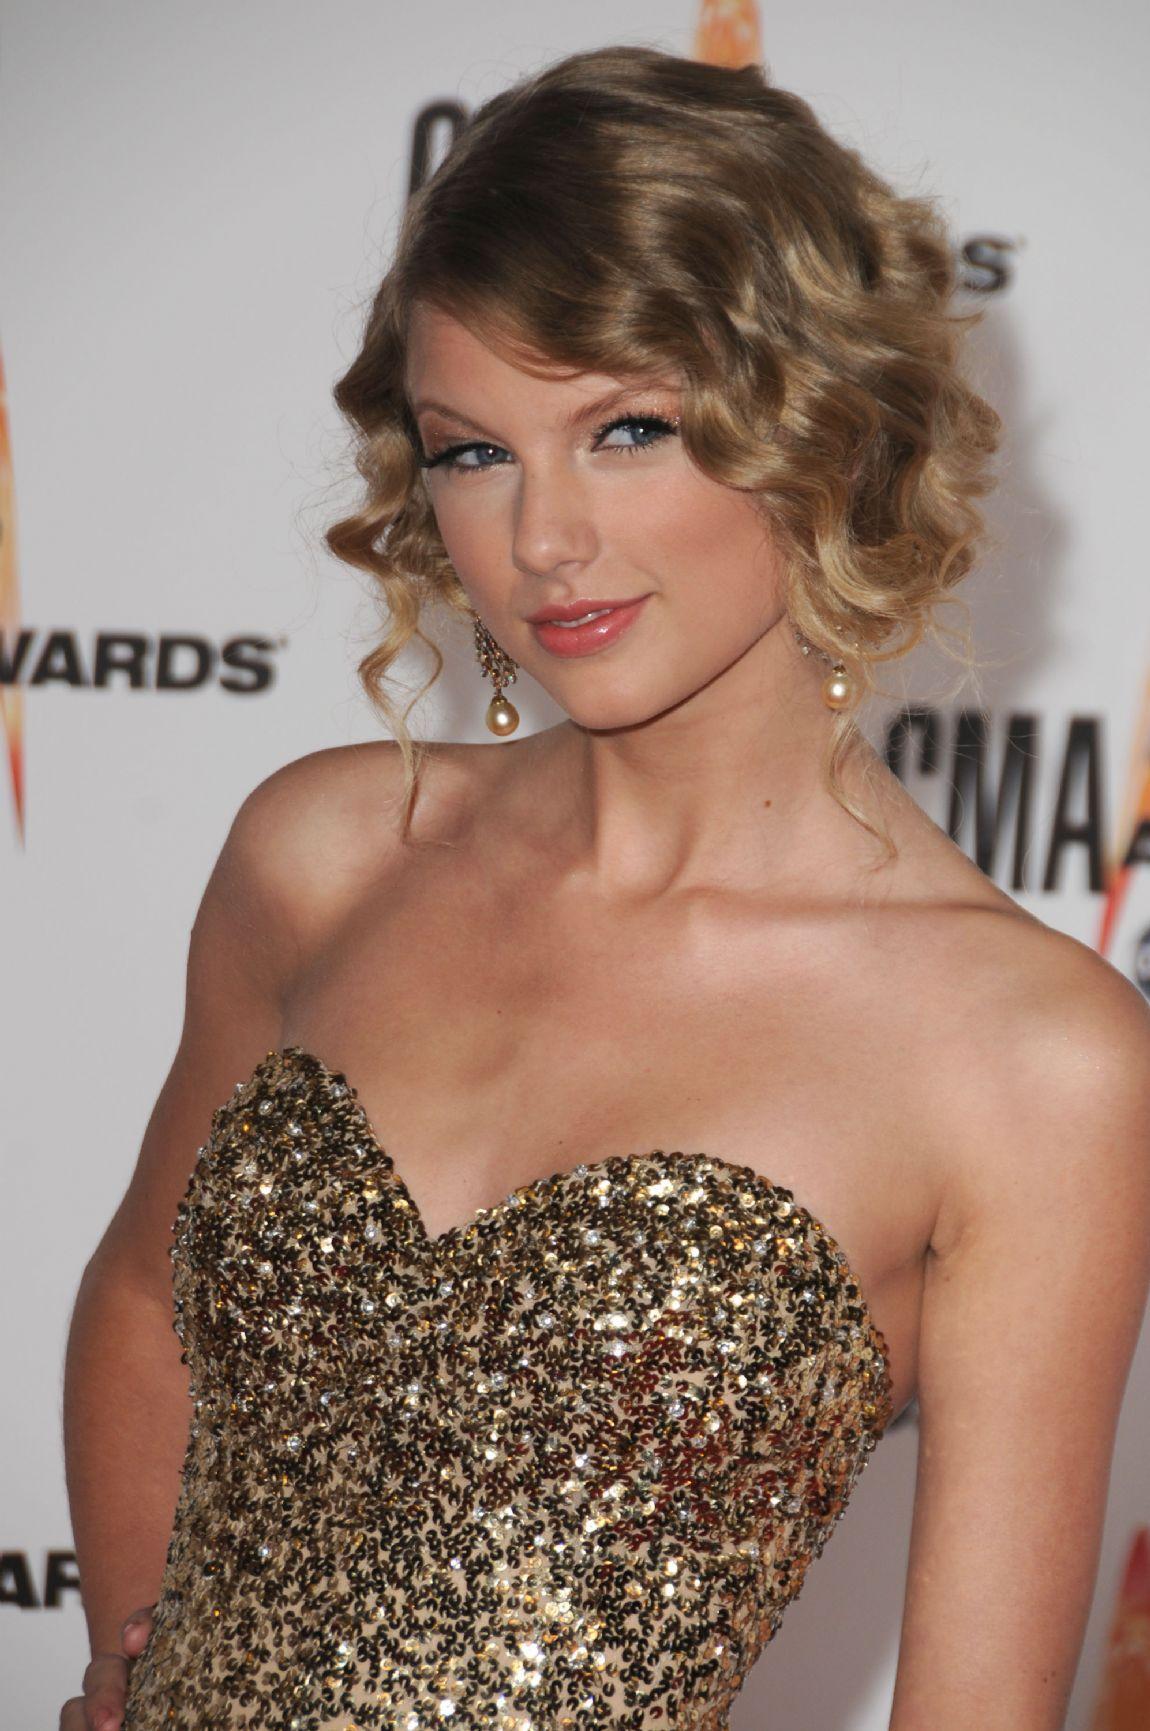 Taylor Swift 2009 Nip Slip Acm Daedalusdrones Com